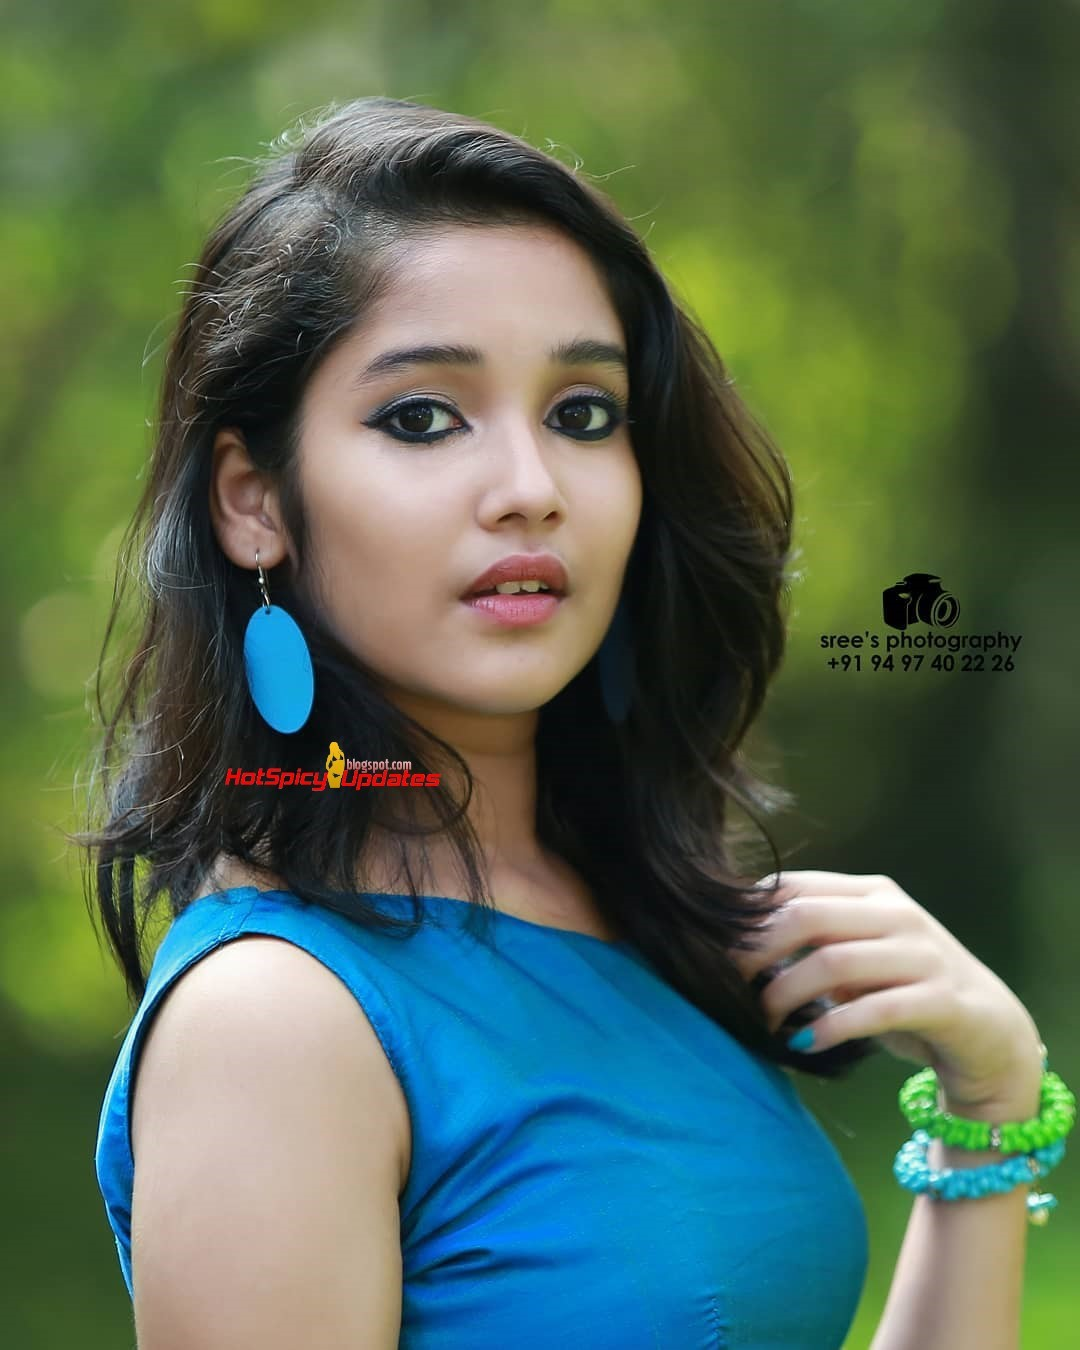 Anikha Surendran Aka Baby Anikha Cute And Stylish Photo